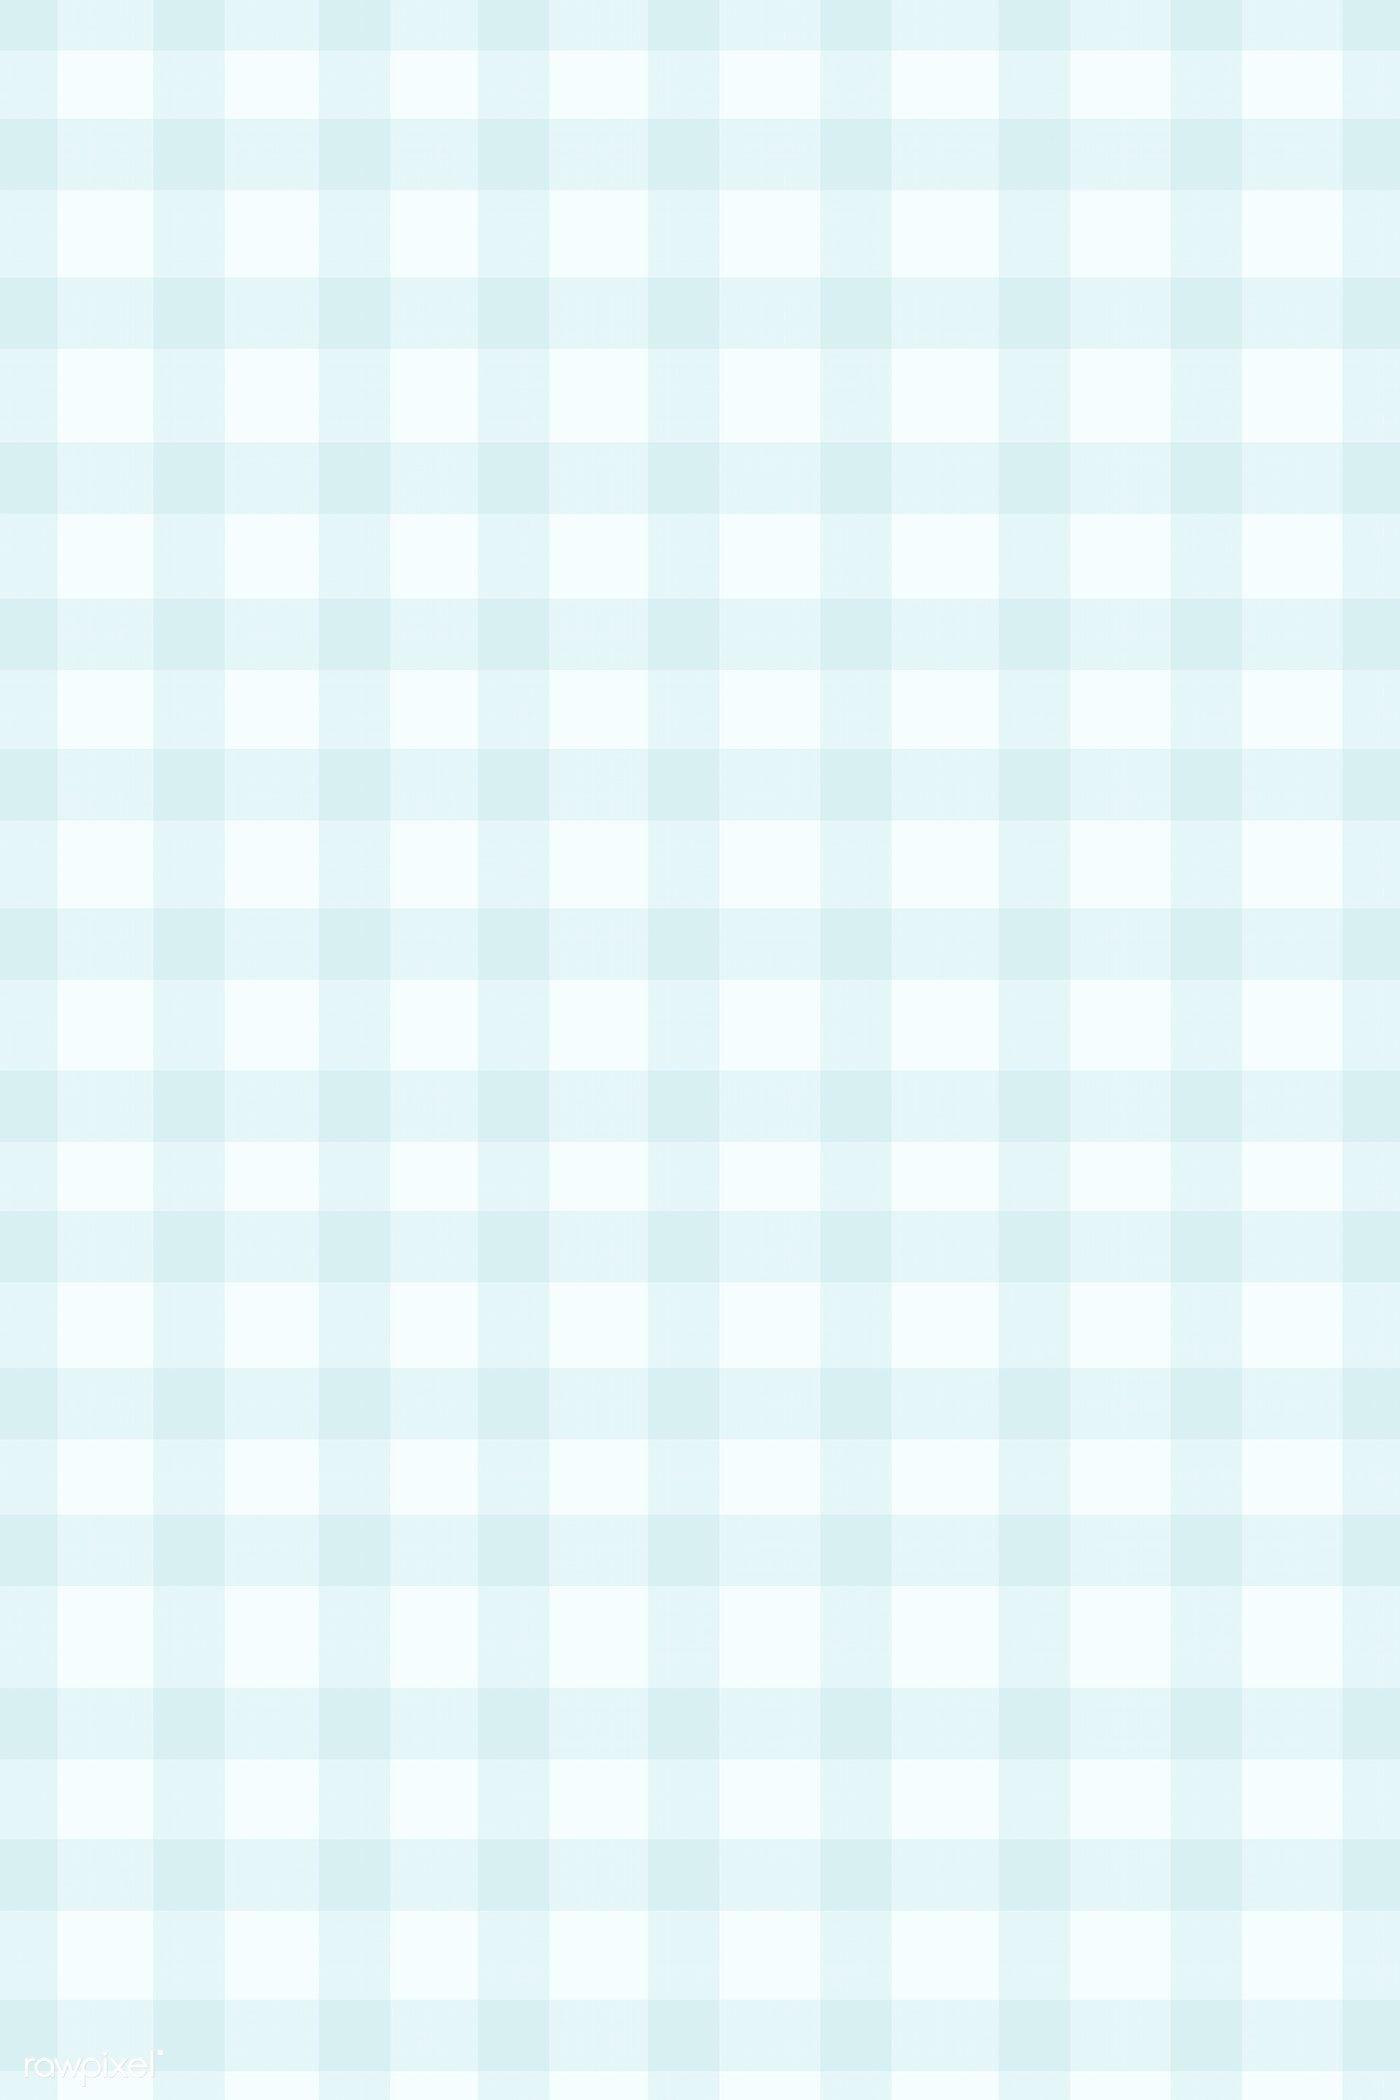 Blank Blue Notepaper Design Vector Free Image By Rawpixel Com Ilustrasi Daun Papan Warna Kotak Kotak